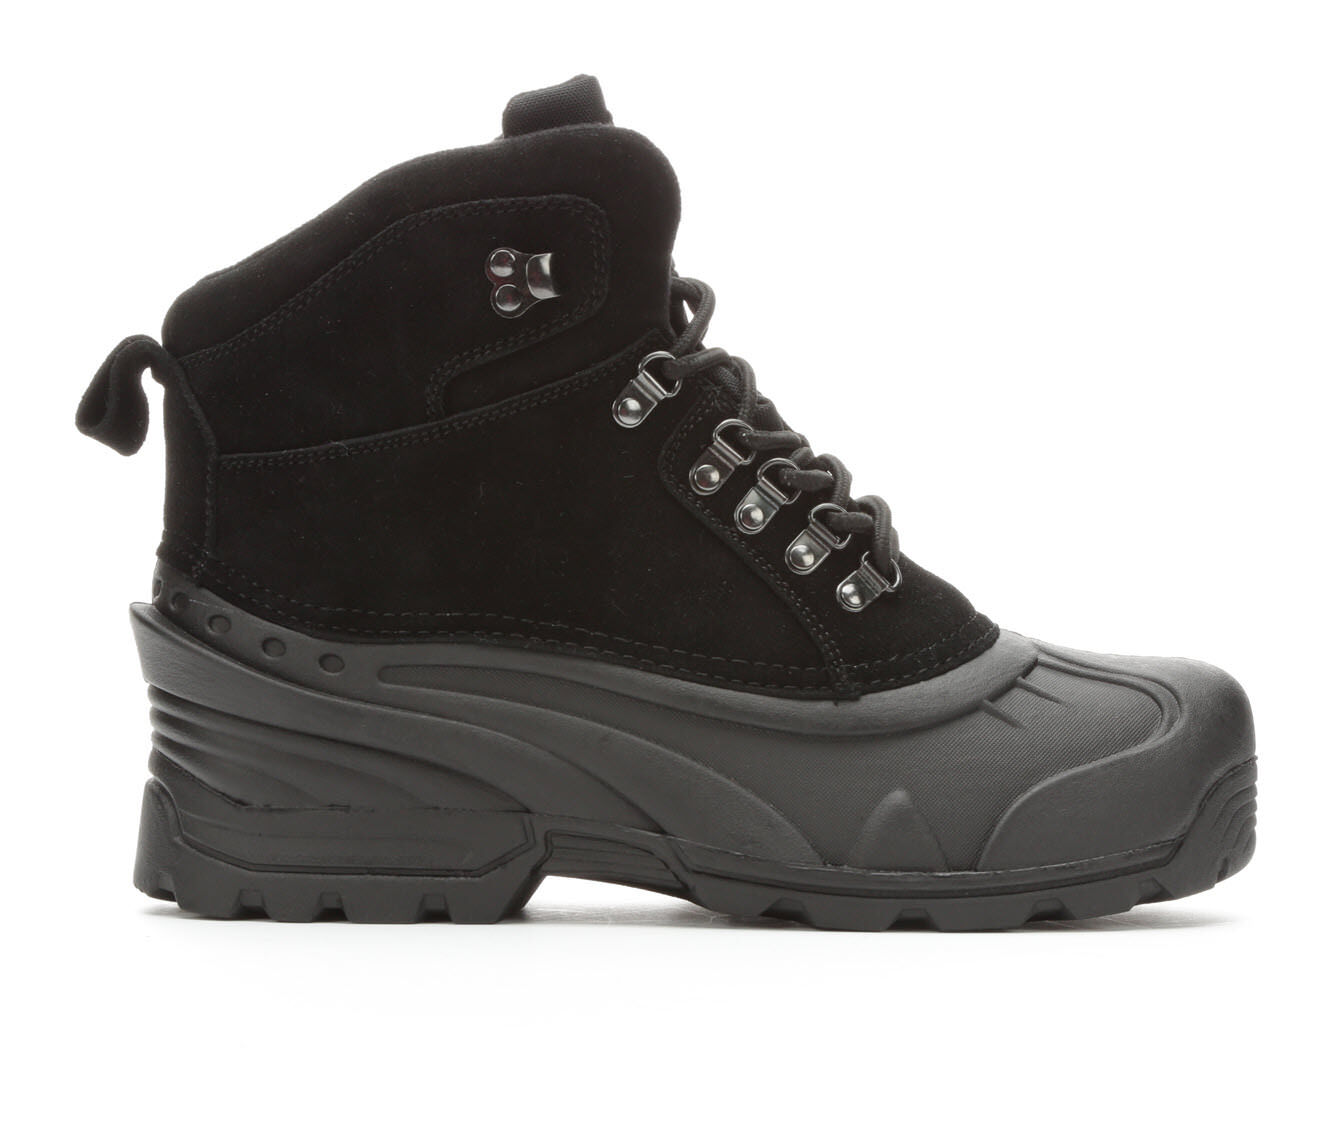 Men's Itasca Sonoma Ice House II Winter Boots Black